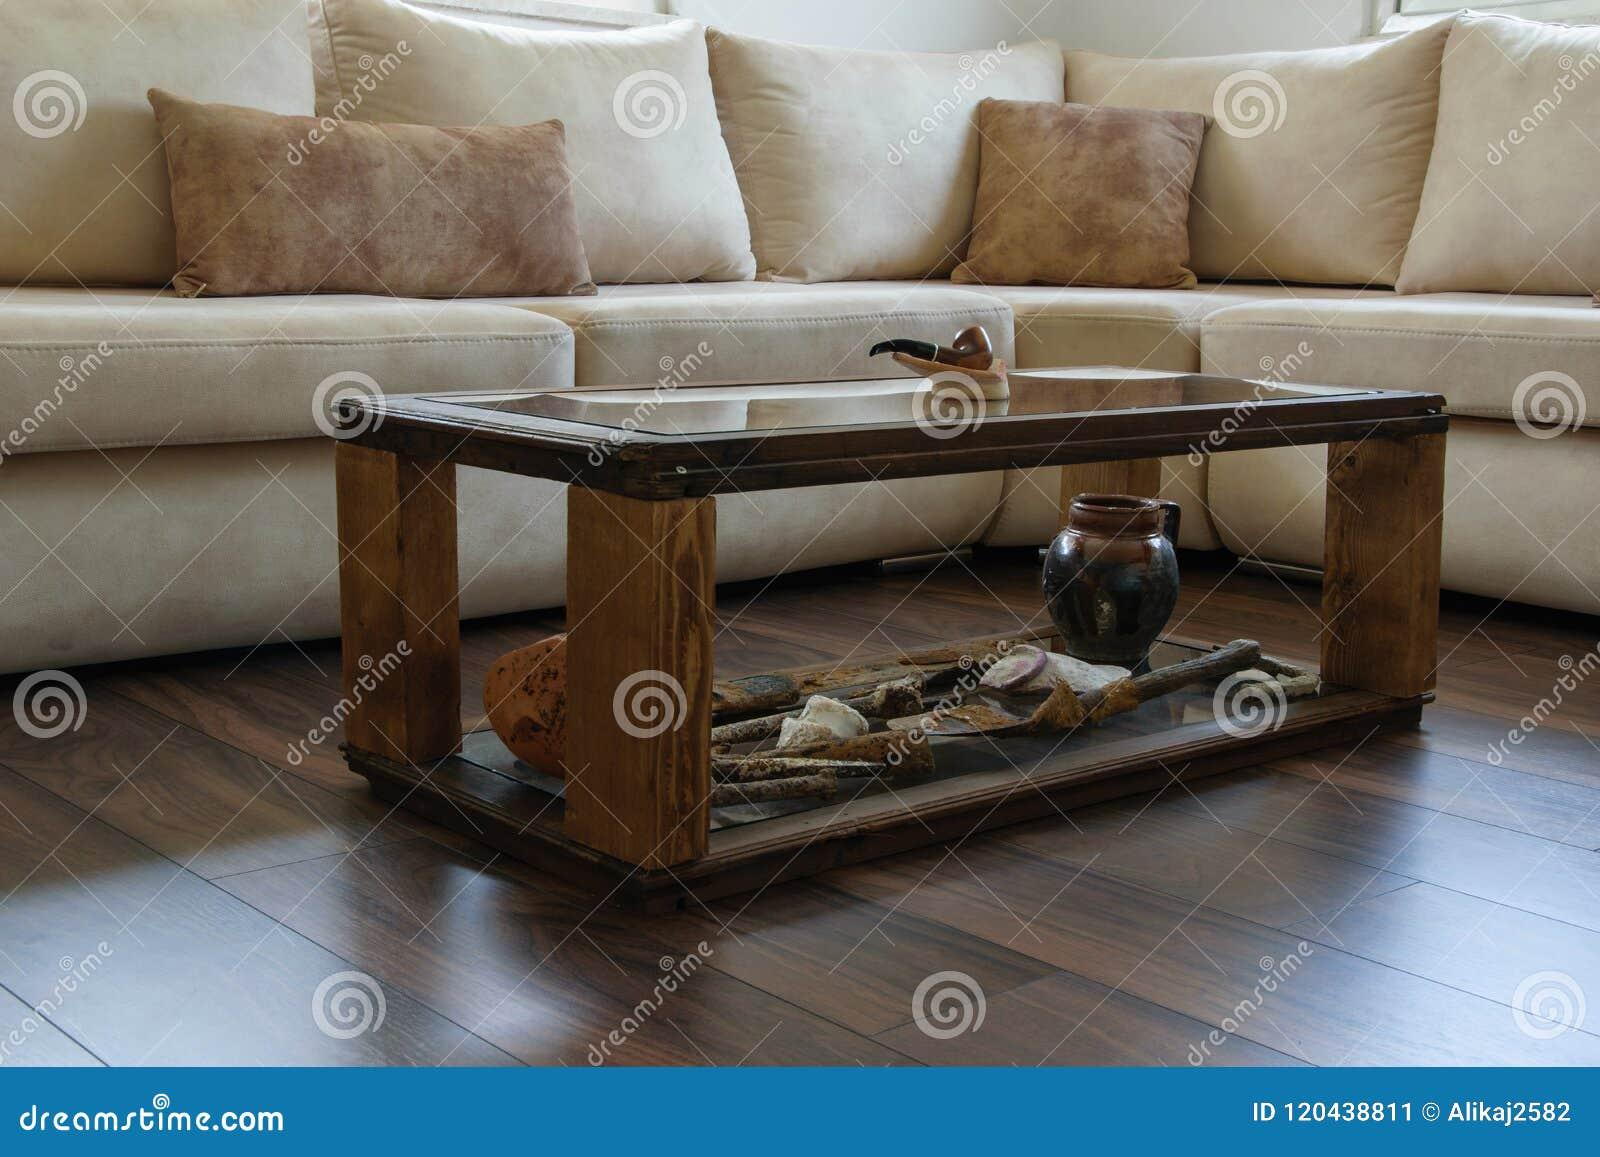 Home Interior Design Comfortable Contemporary Sofa In